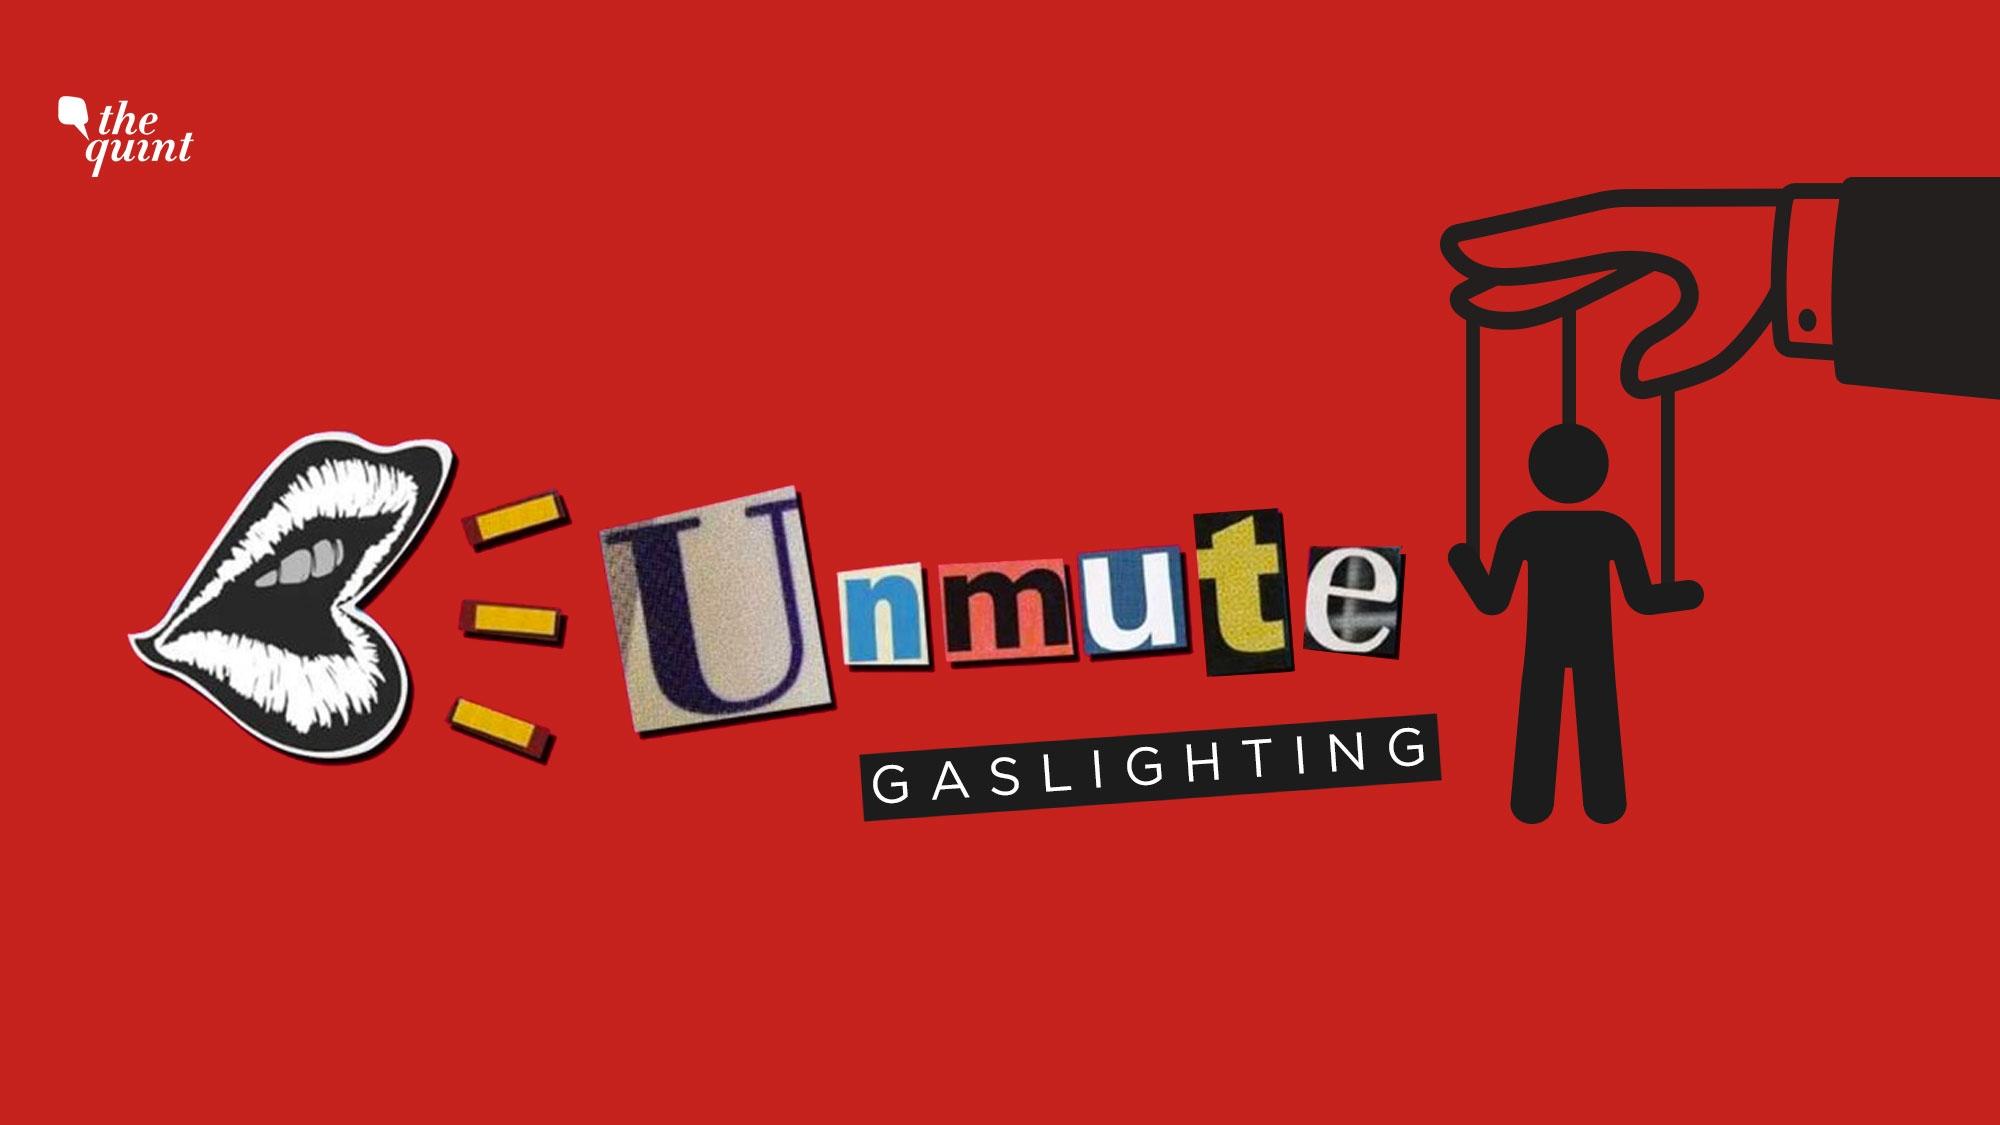 Unmute Ep 5: The Subtle Art of Gaslighting